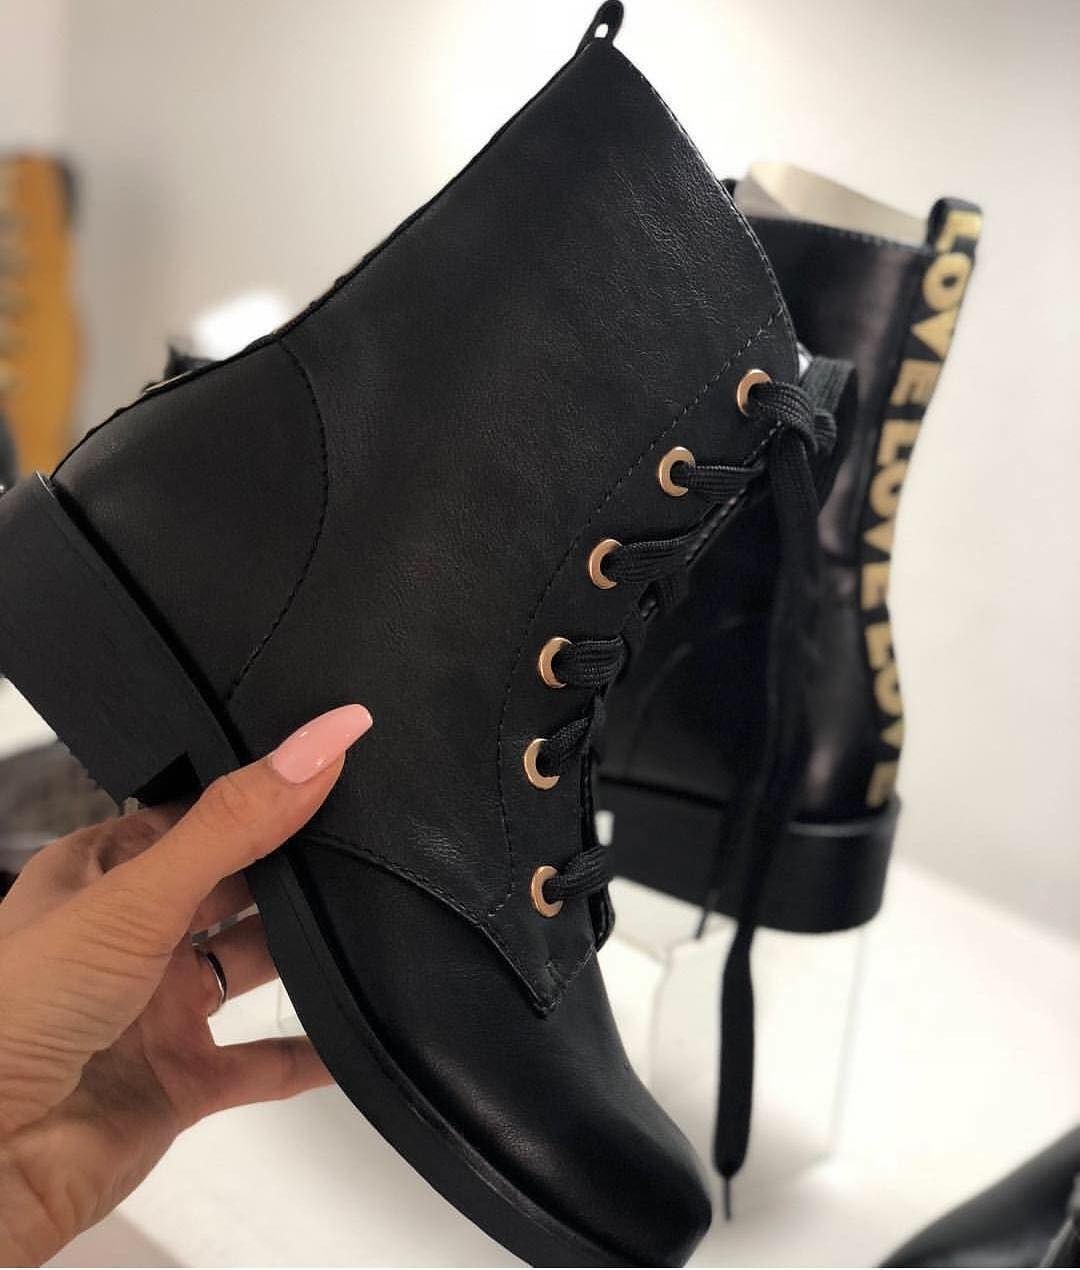 tendencias botines 2018 tacon bajo, Botines de moda 2018